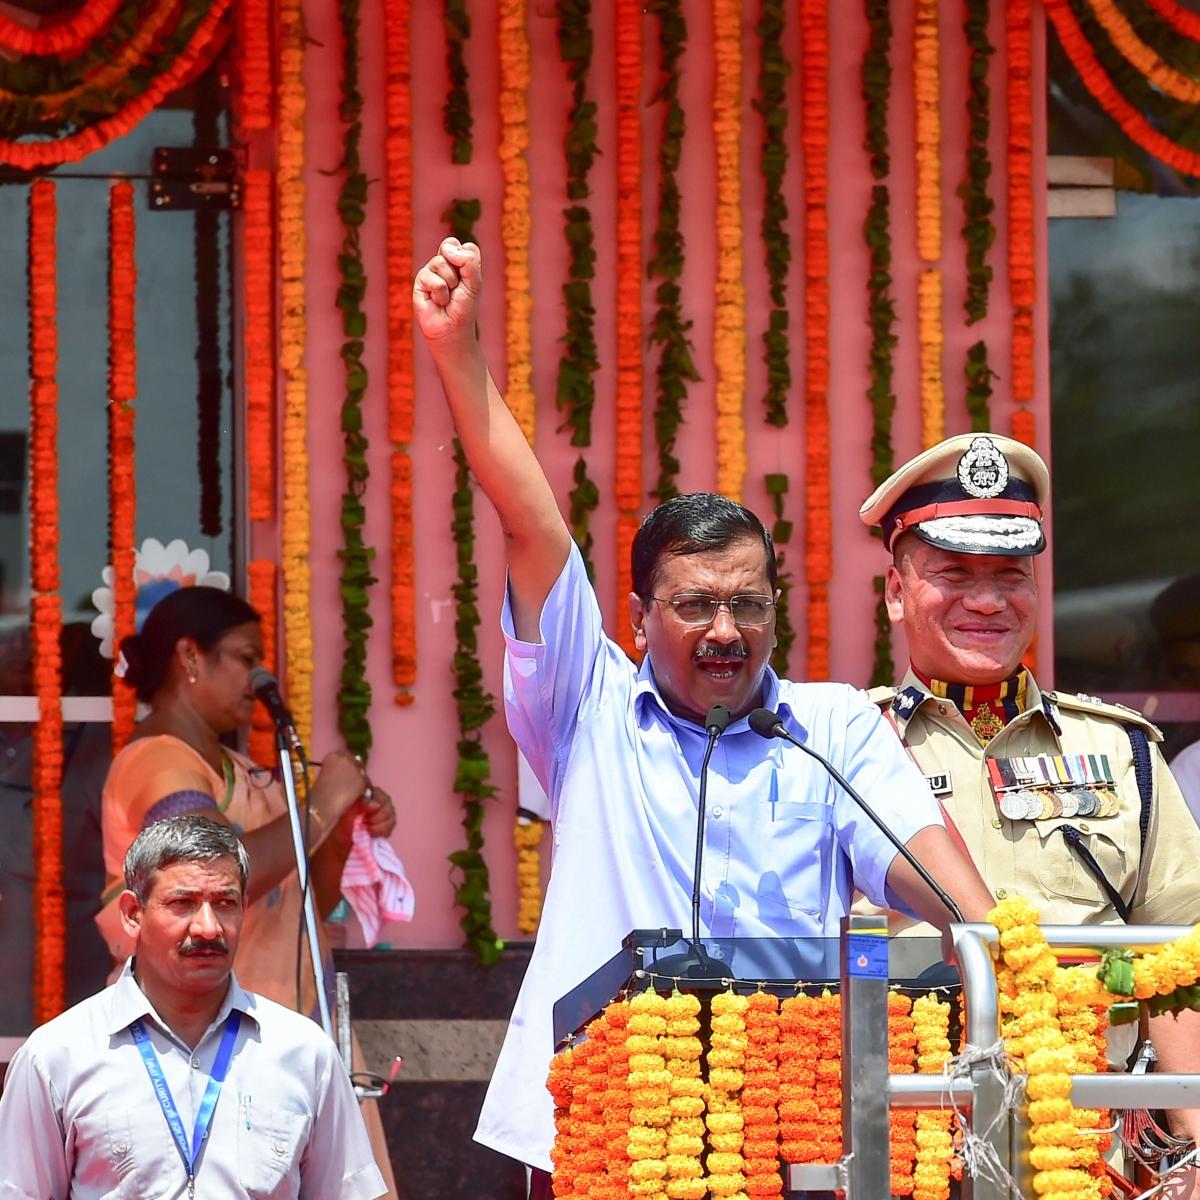 Arvind Kejriwal turns 51, Narendra Modi greets him